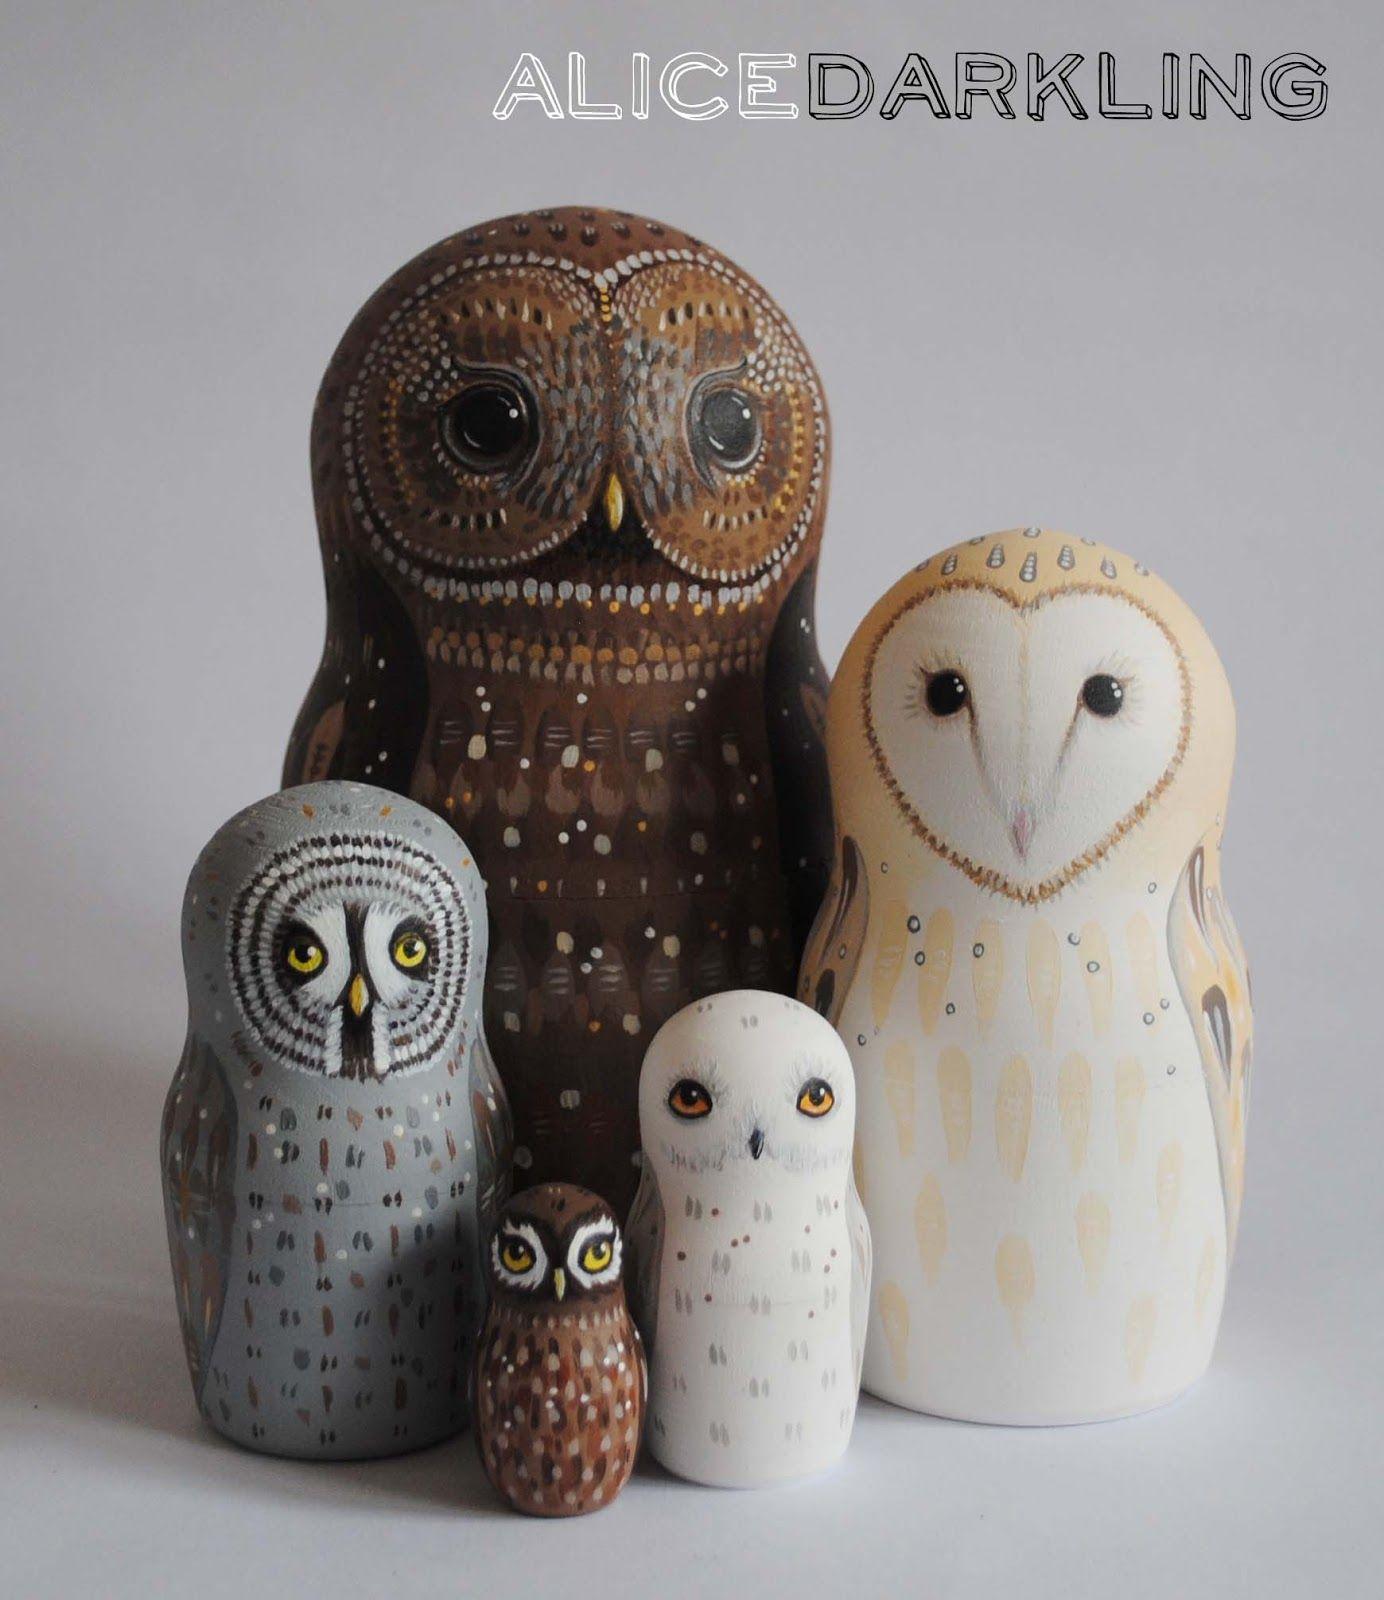 5Pcs Wooden Whale Penguin Animal Matryoshka Nesting Dolls Figurines Kids Toy USA